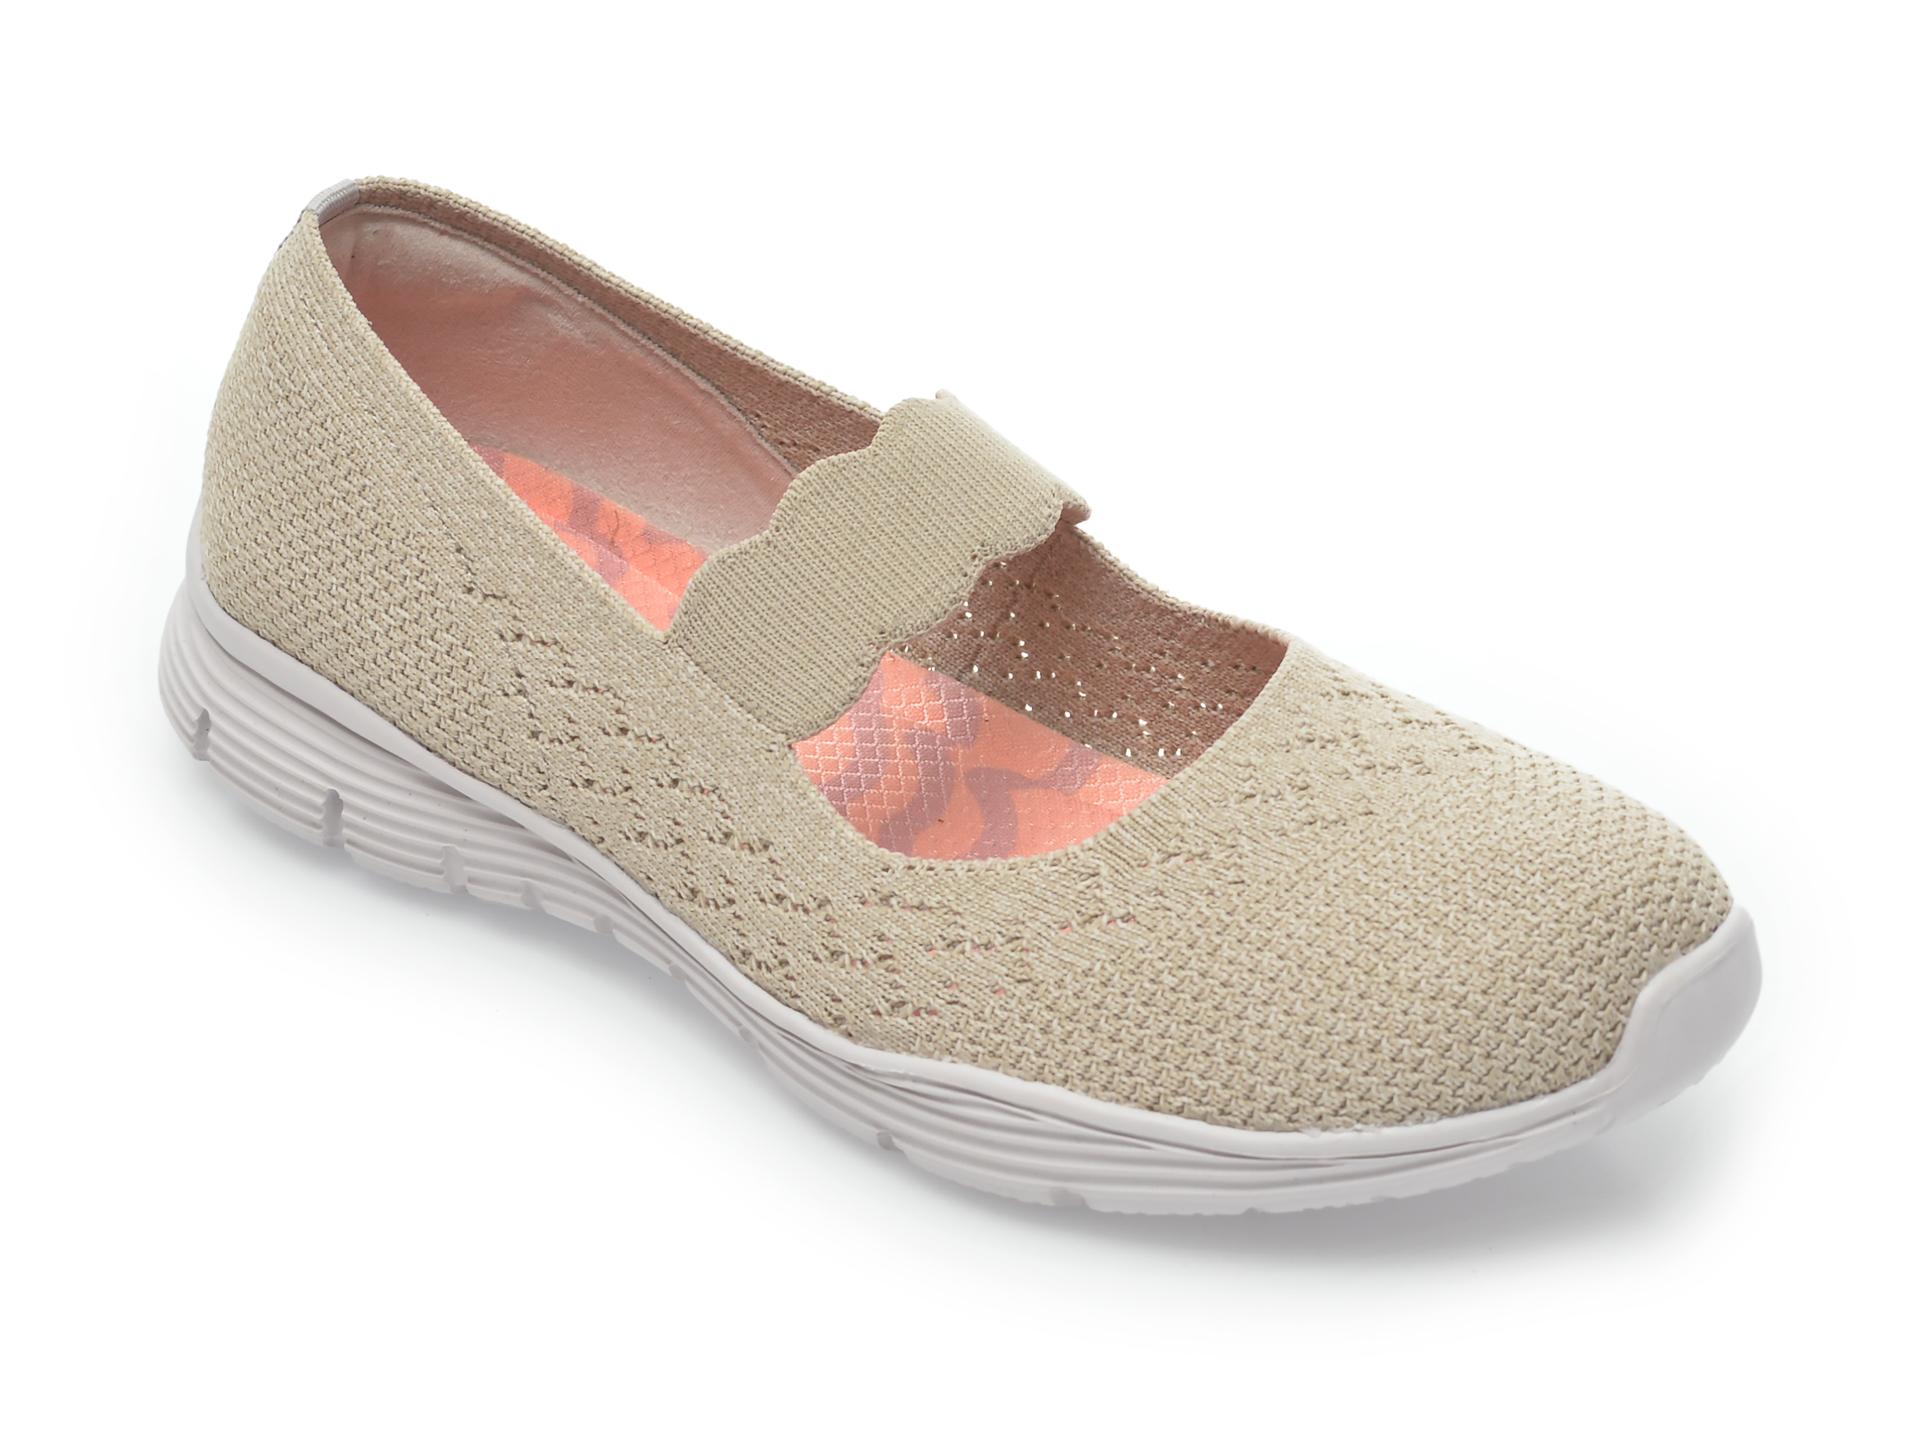 Pantofi sport SKECHERS bej, Seager Power Hitter, din material textil New